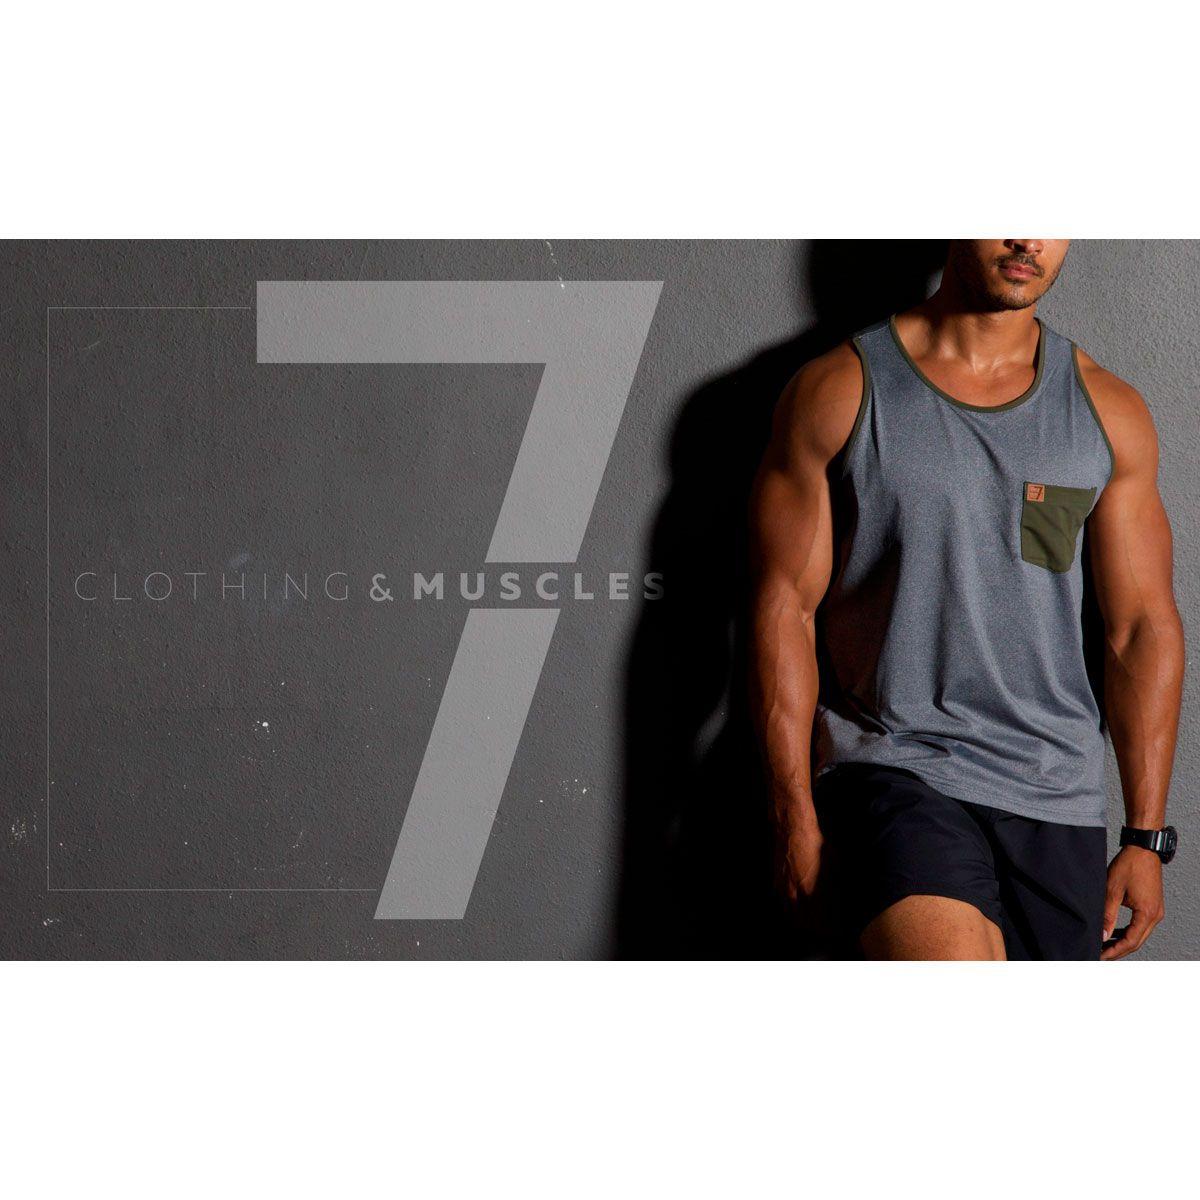 Regata Masculina Esportiva Cinza Mescla - SEV7N Clothing Muscles